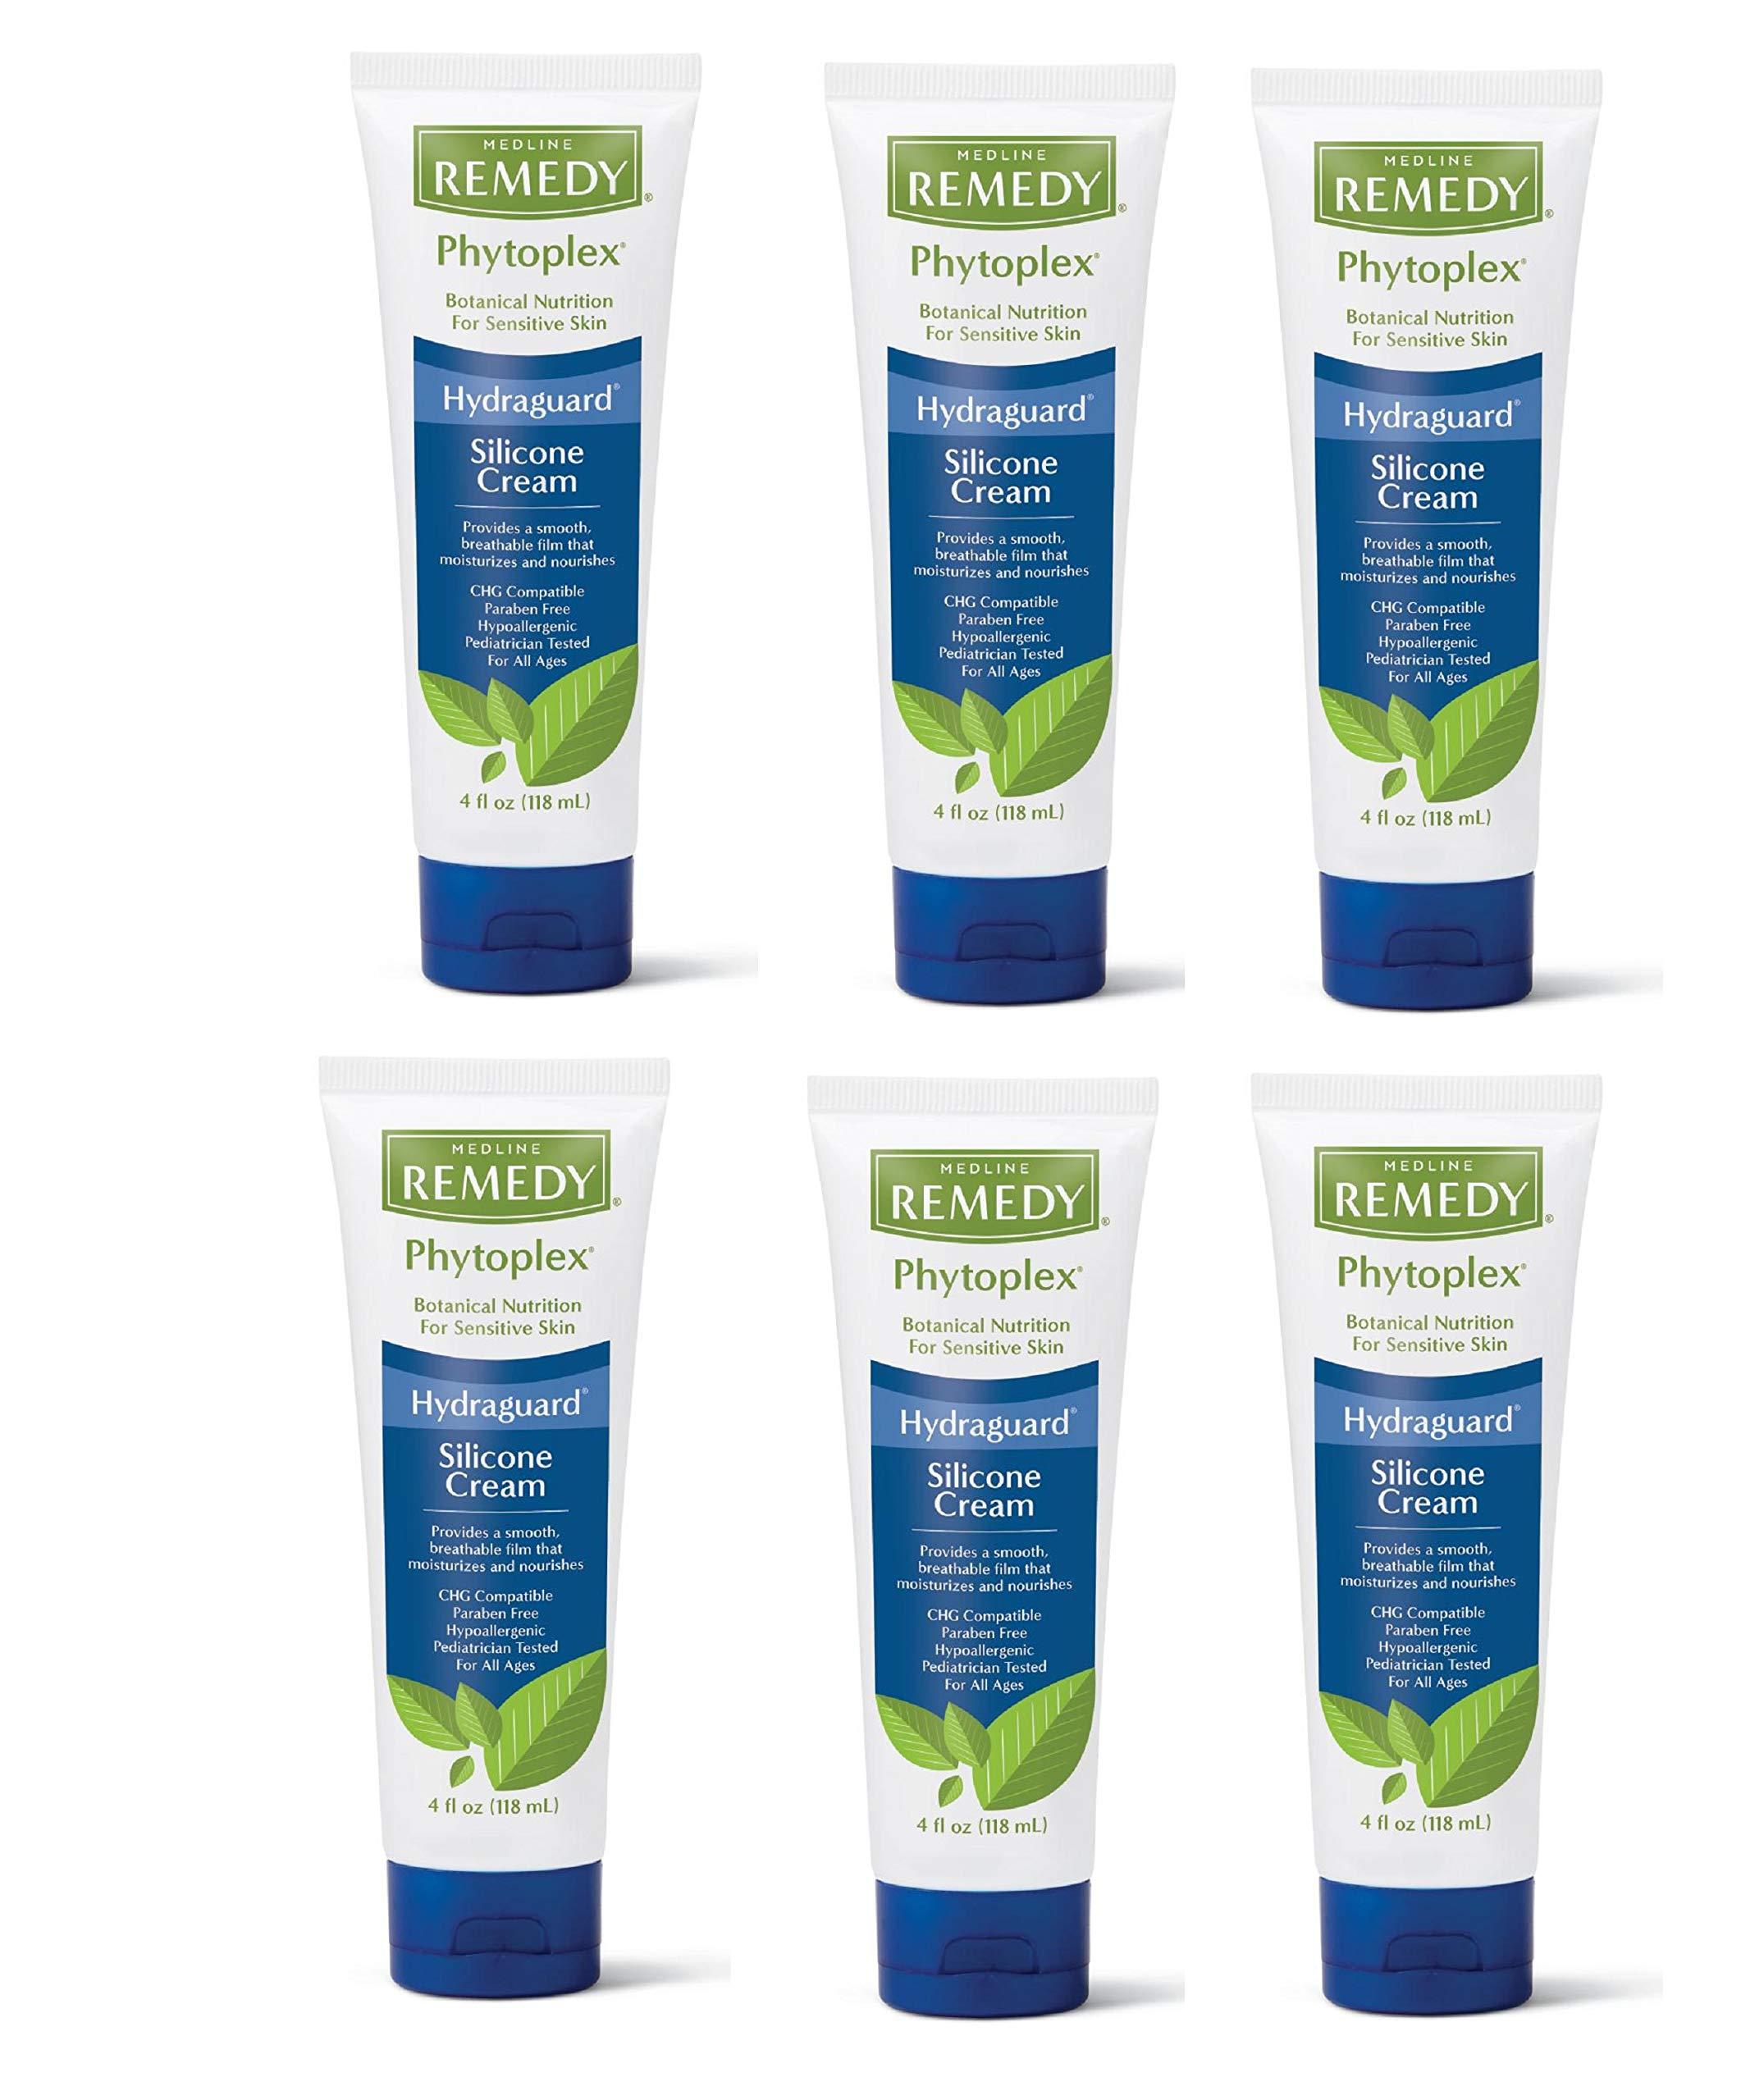 Medline Remedy Hydraguard Phytoplex Cream MSC092534 - 4 Ounce Tubes / 6 Packs